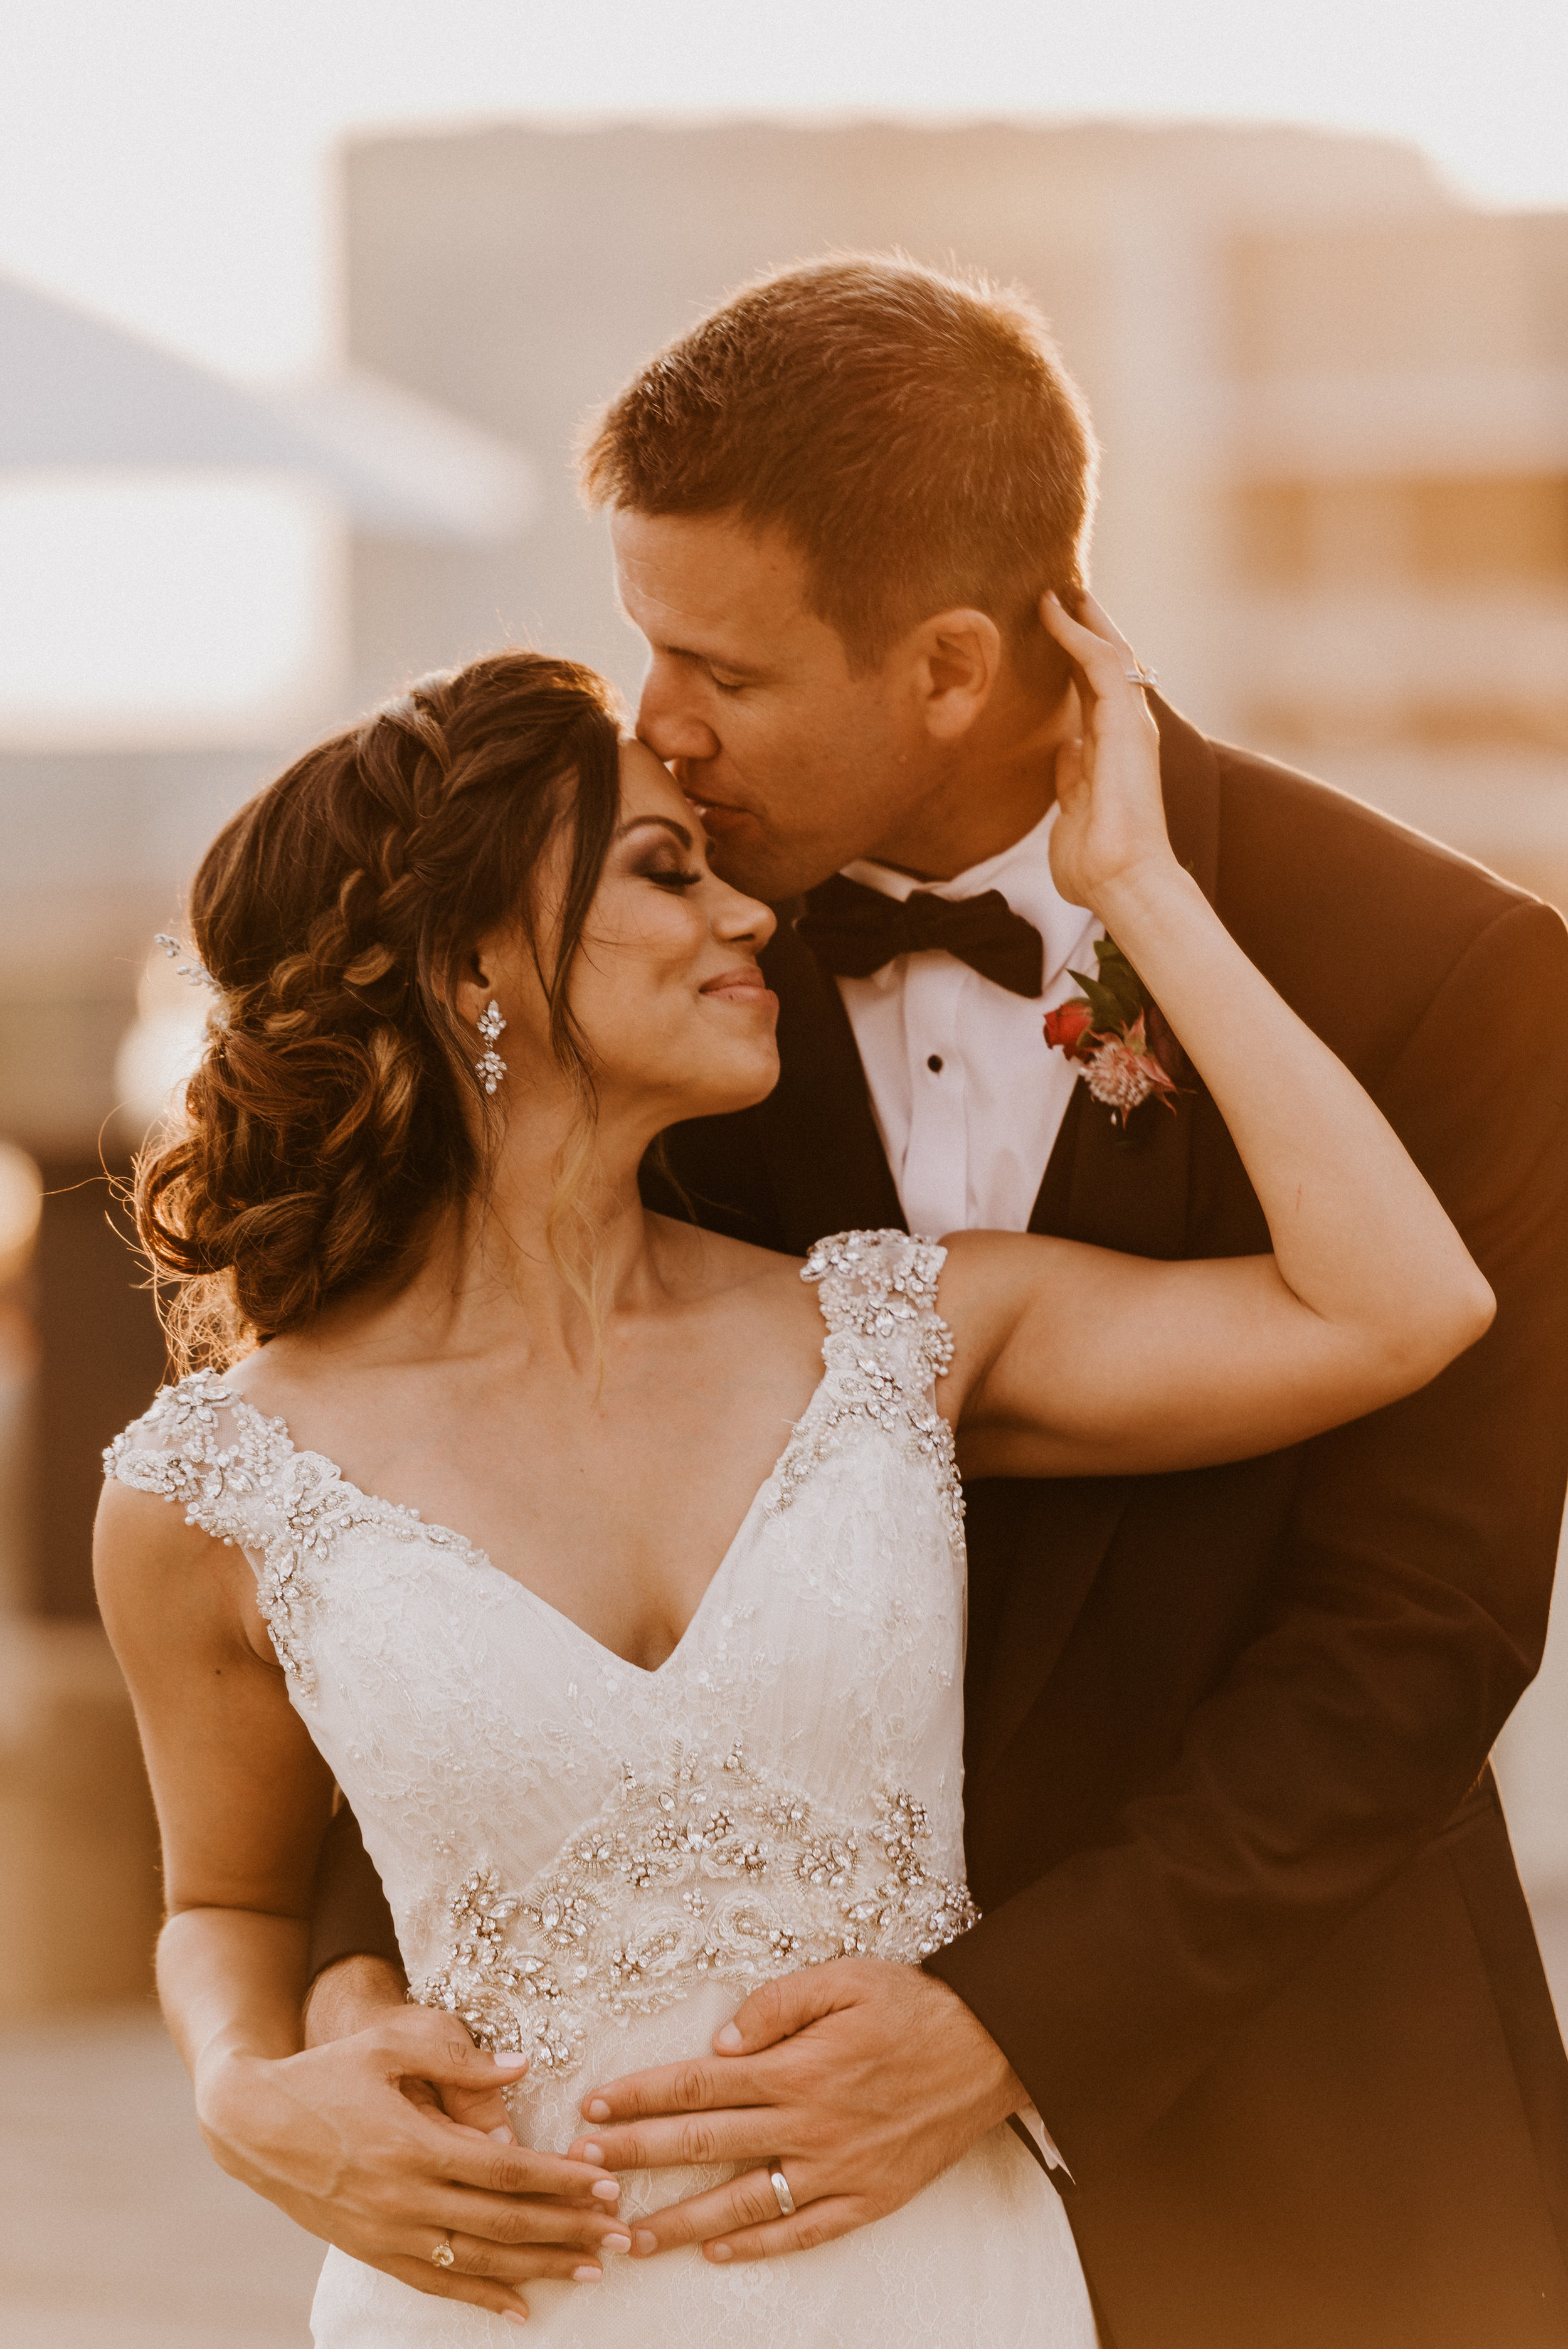 JACKIE JOSH WEDDING 2018-PREVIEW-0035.jpg